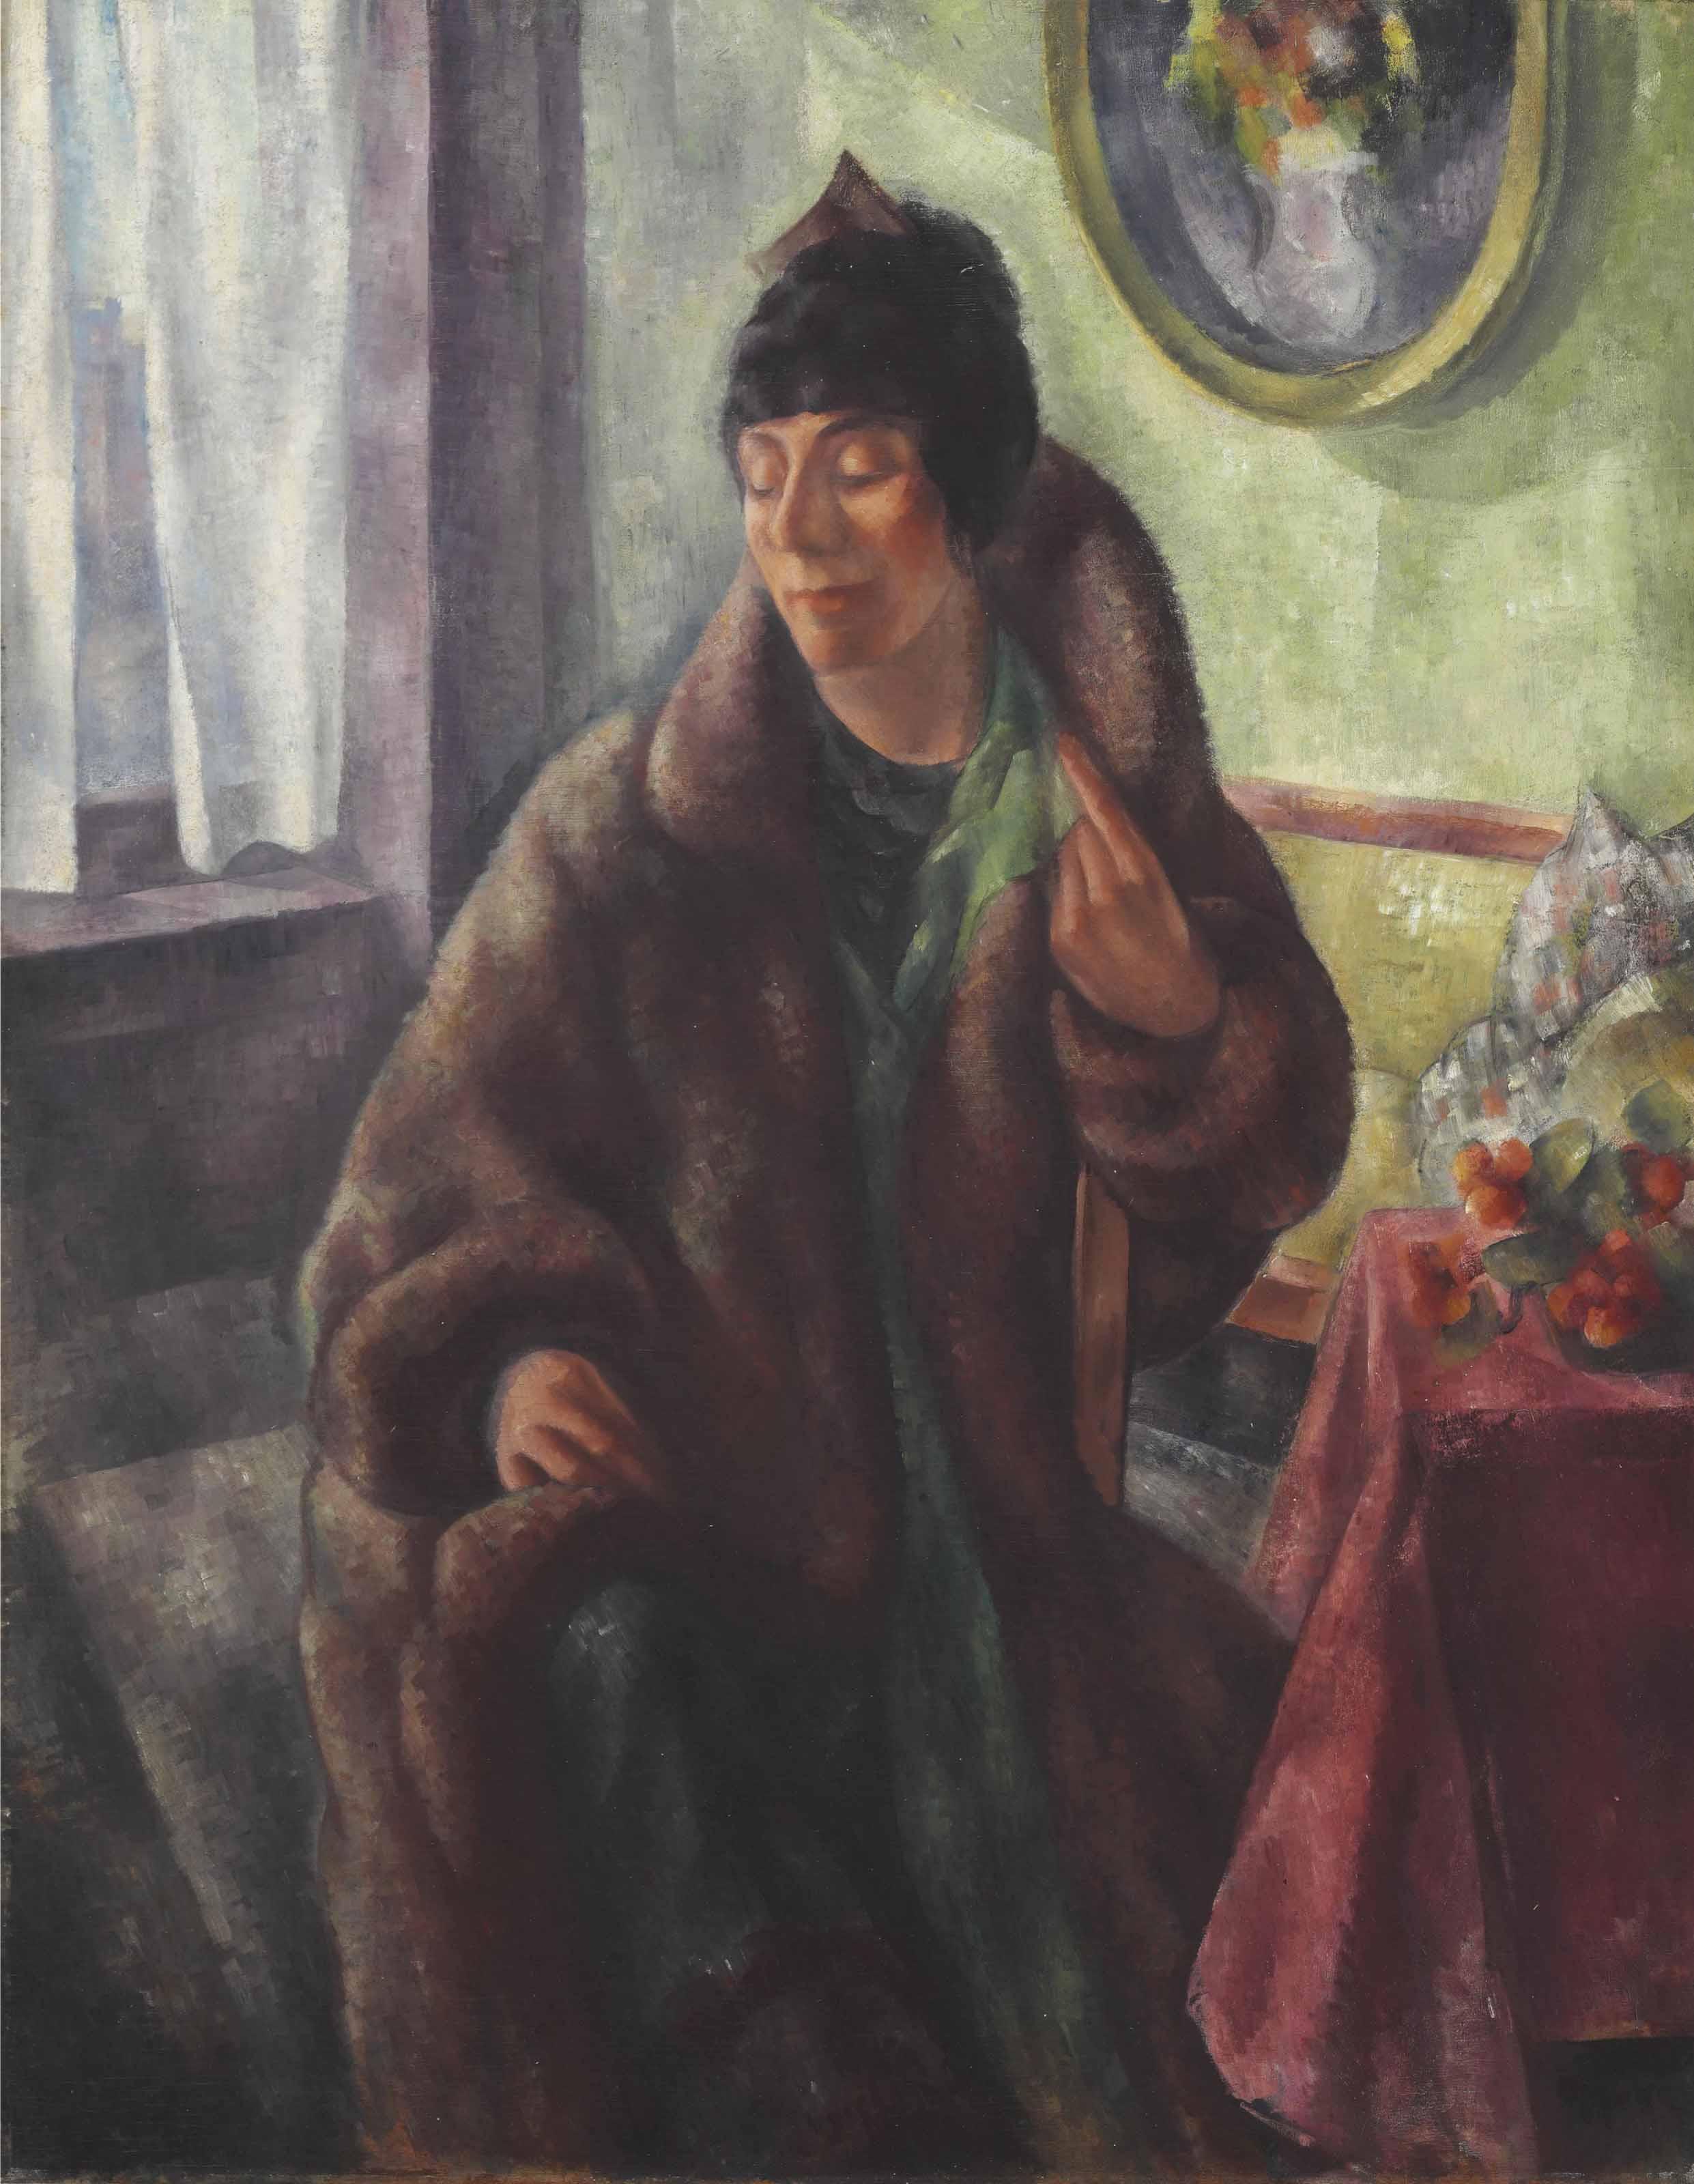 Florence Ballin (Mrs. Konrad Cramer)